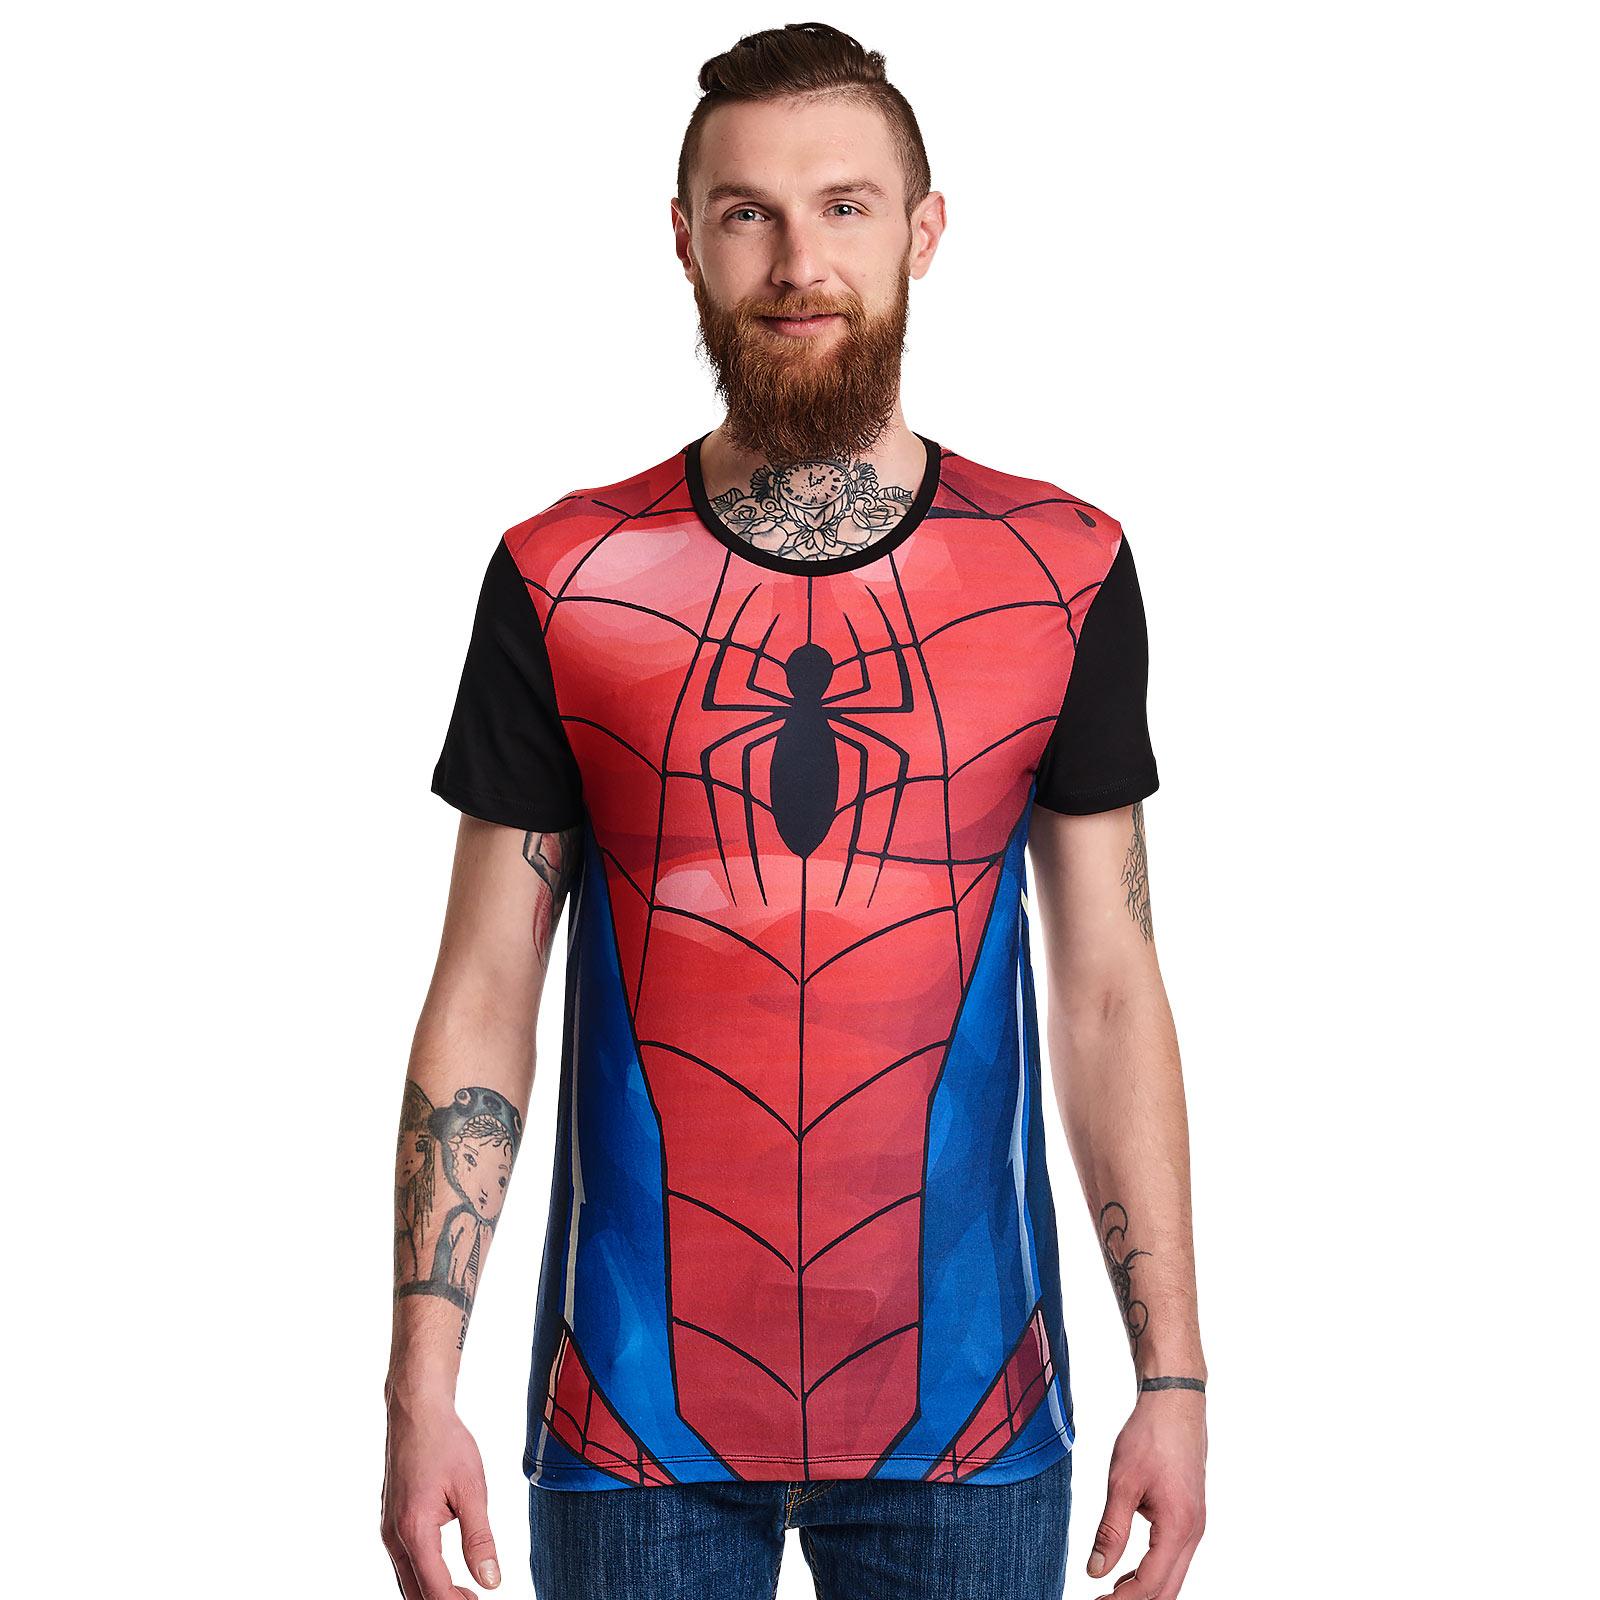 Spider-Man - Lookalike T-Shirt